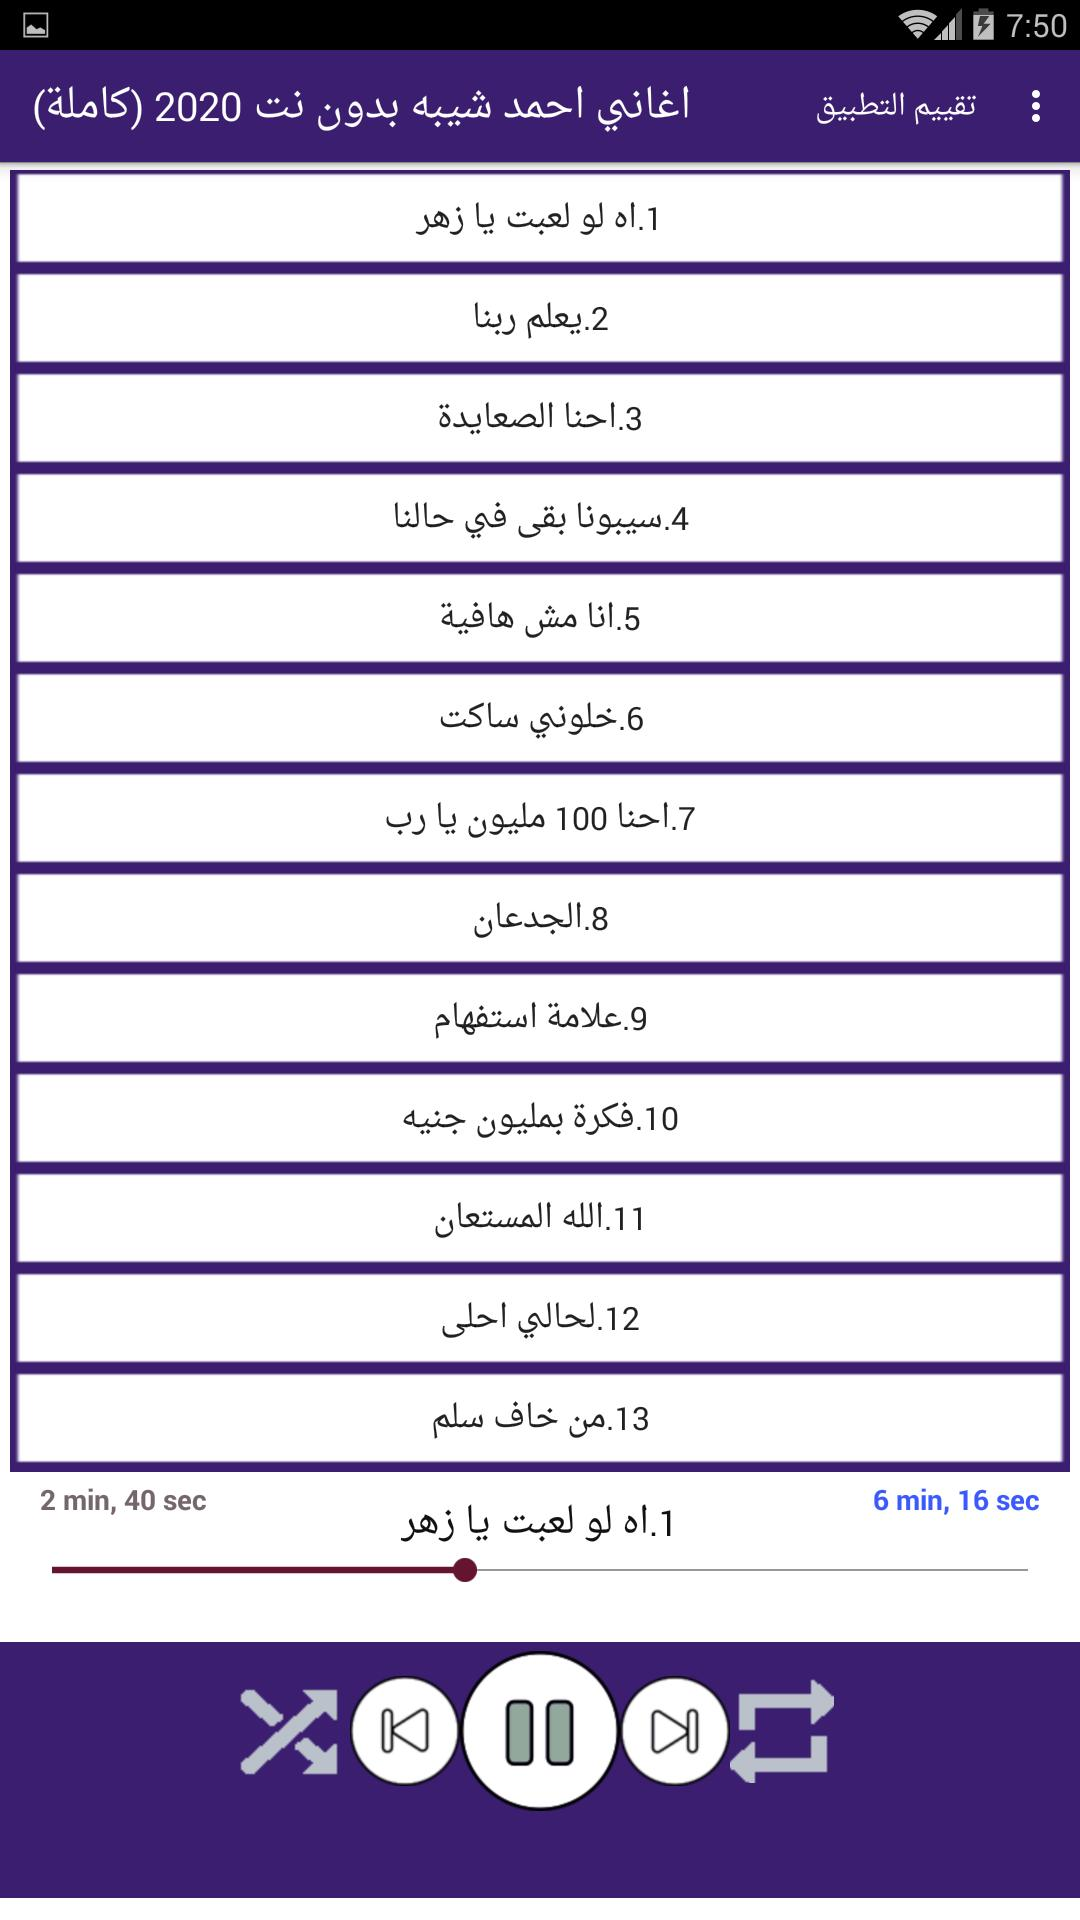 اغاني احمد شيبة بدون نت 2020 كاملة Pour Android